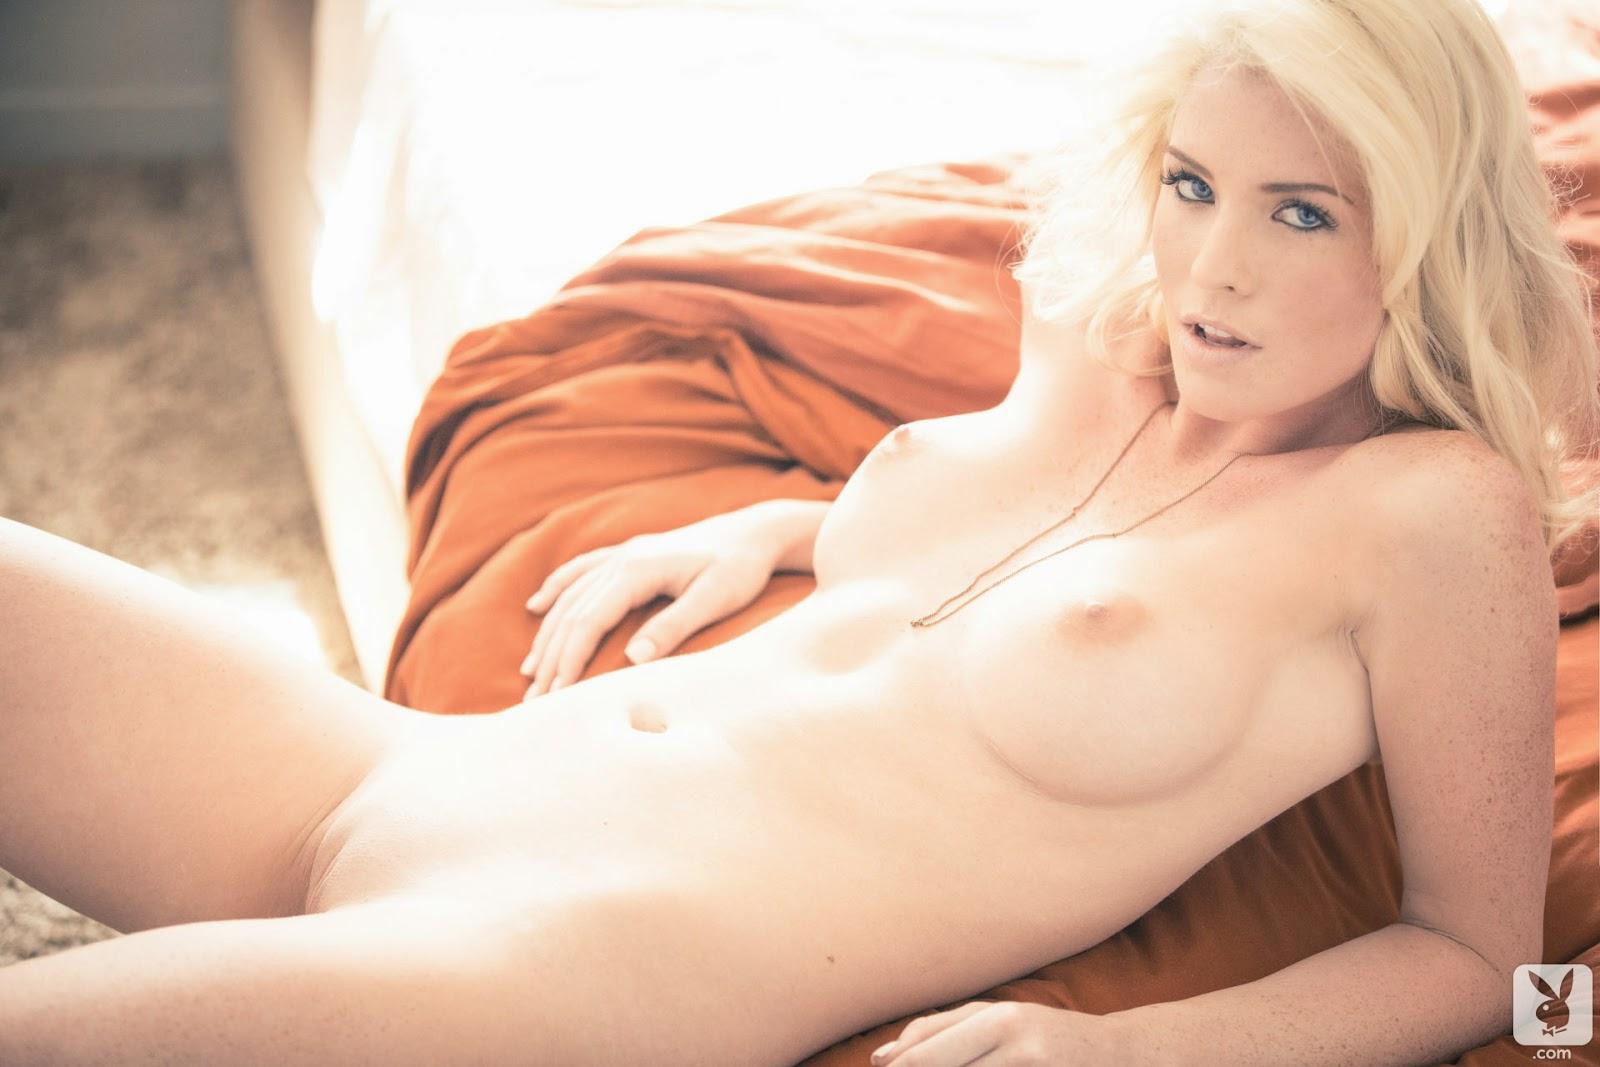 Model lauren bowden nude, barely legal girls gettn fucked by old men